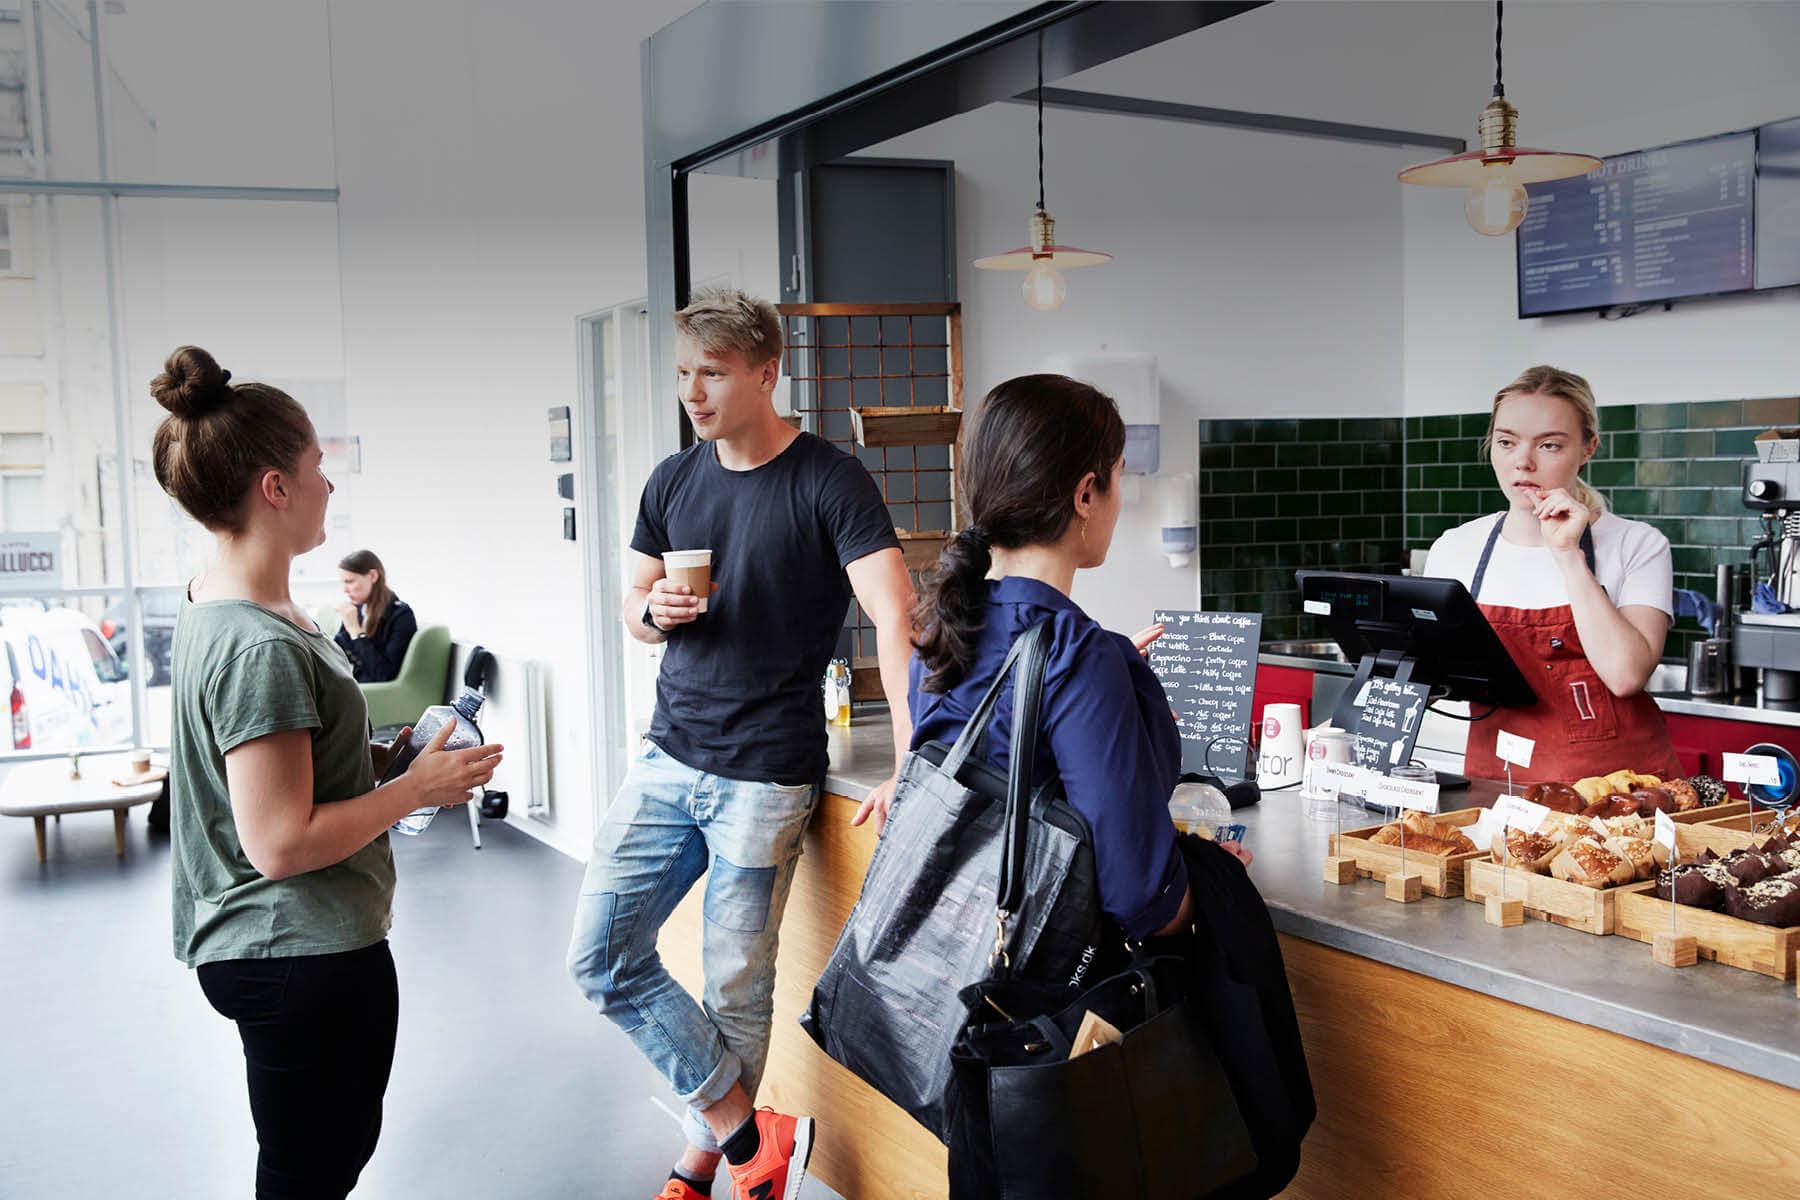 Campus Sigurdsgade - Cafe